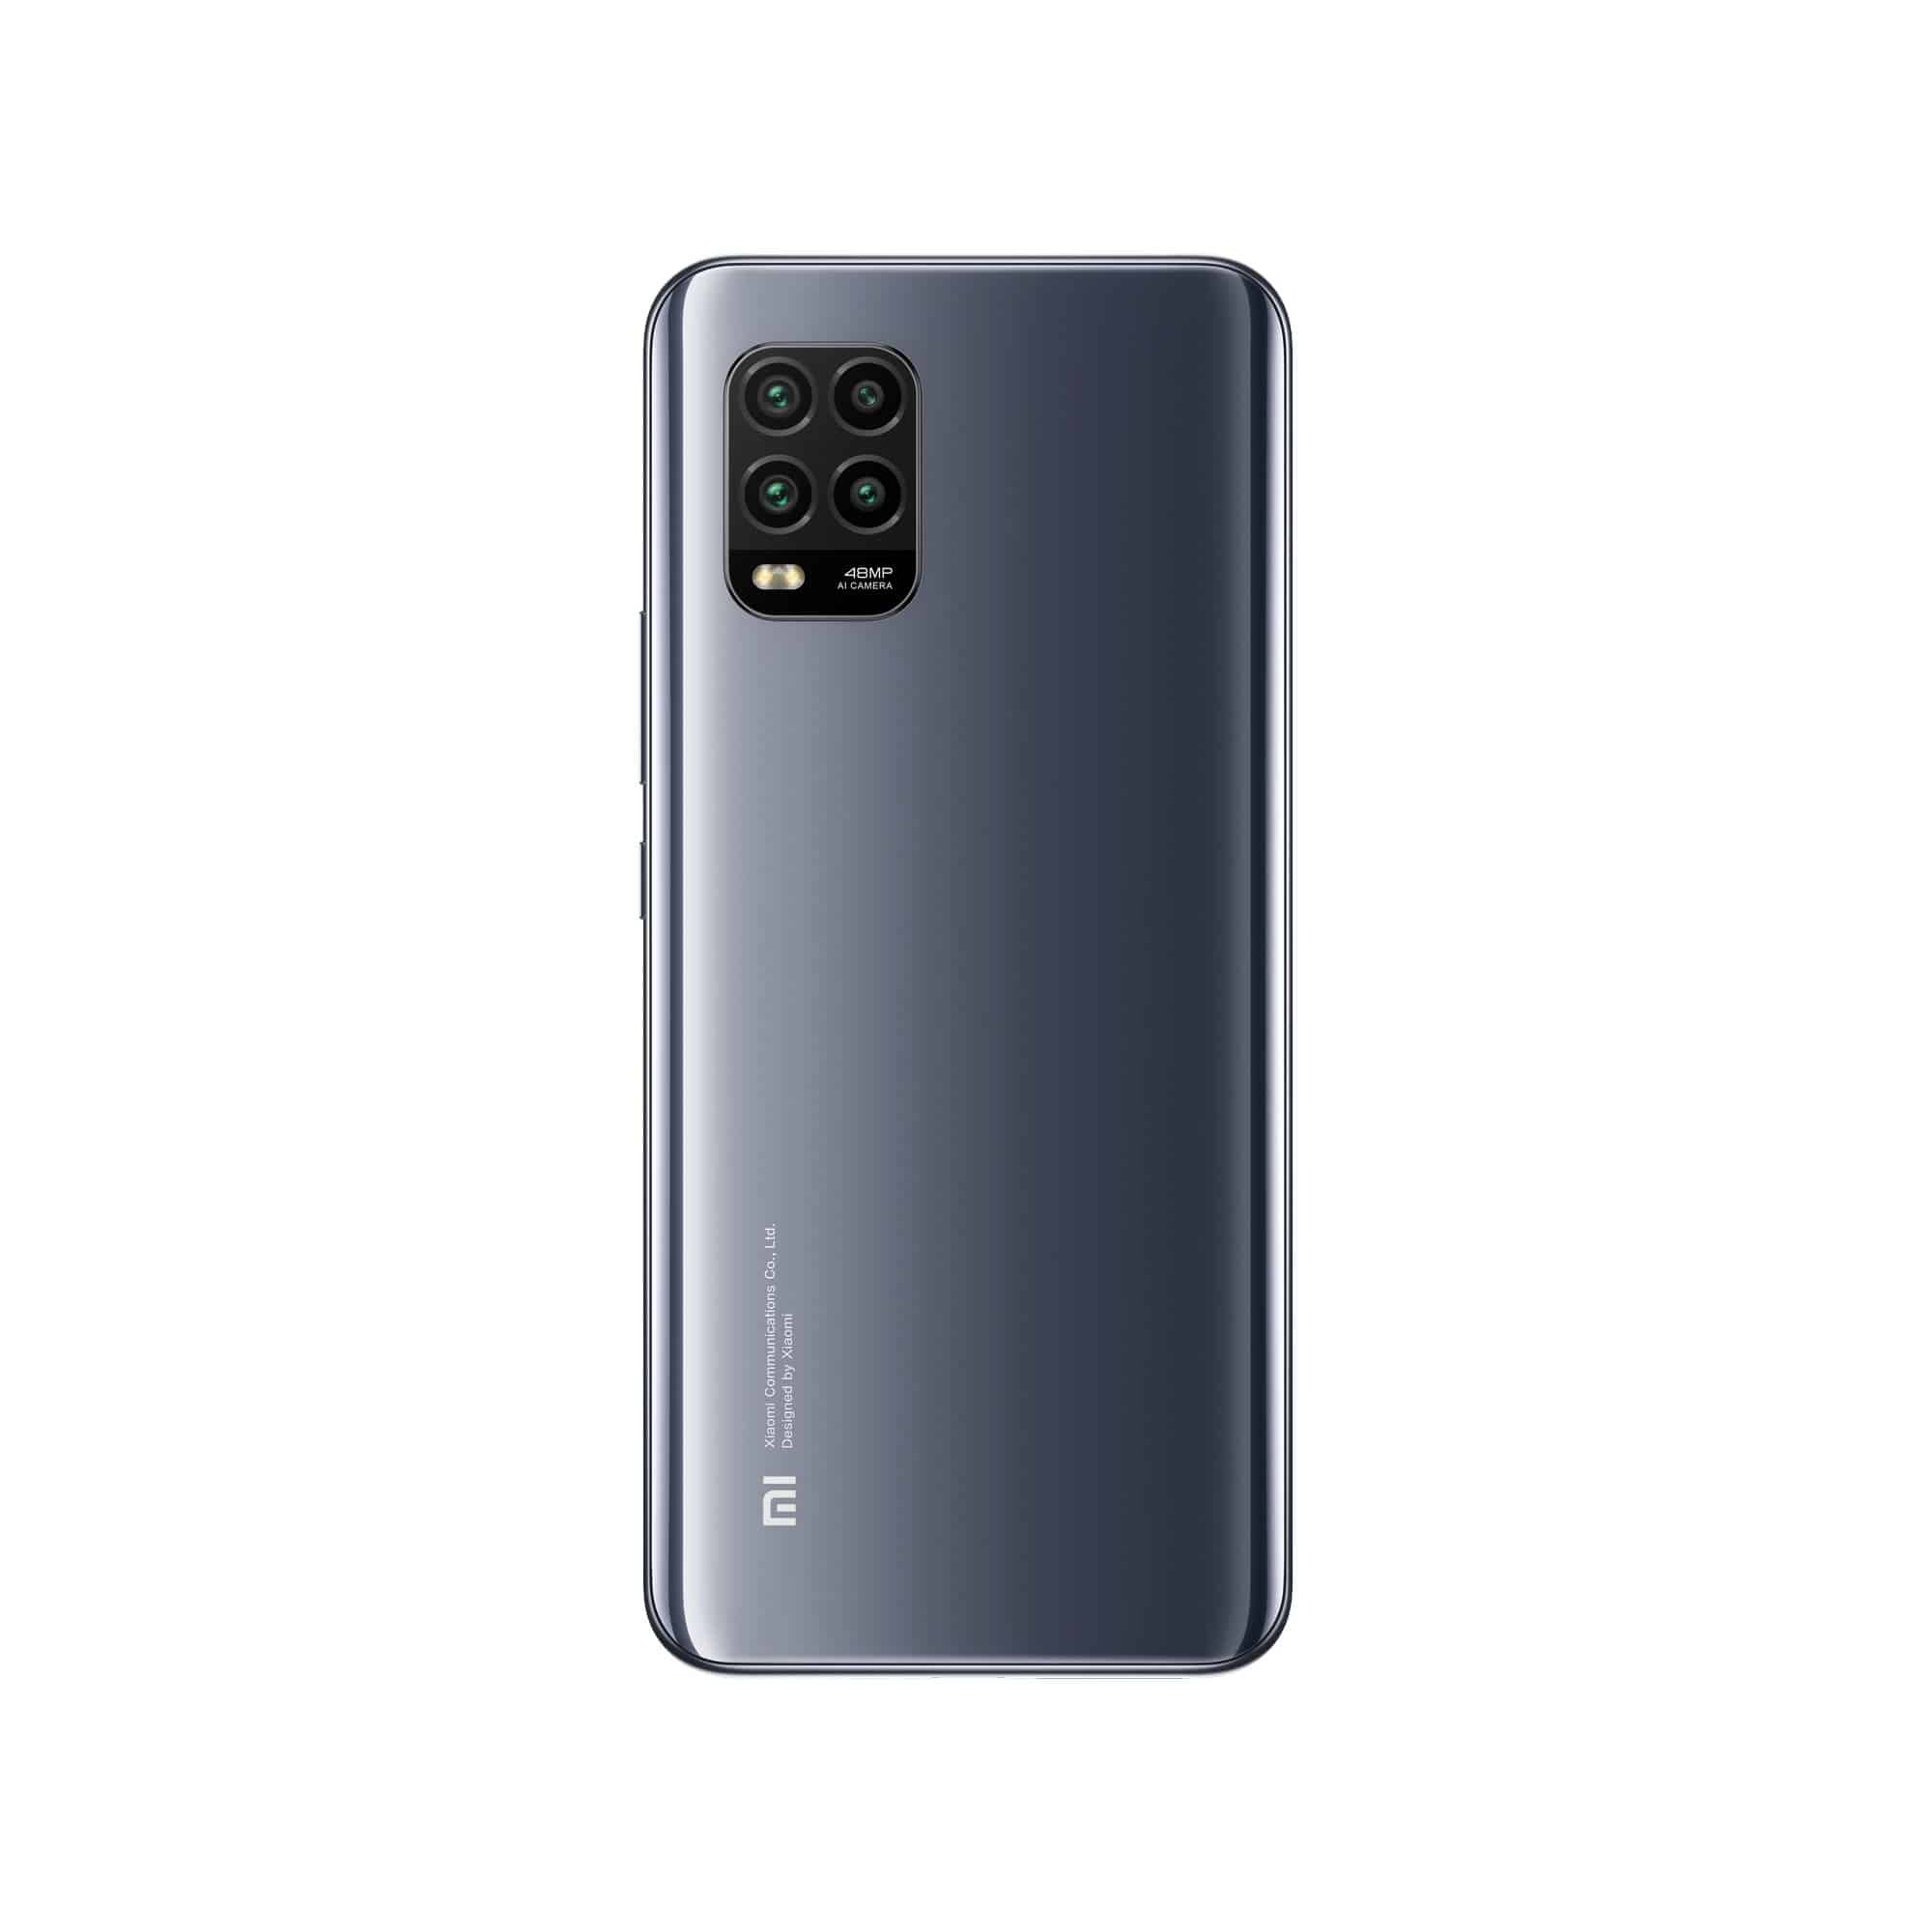 Xiaomi Mi 10 Lite image 3